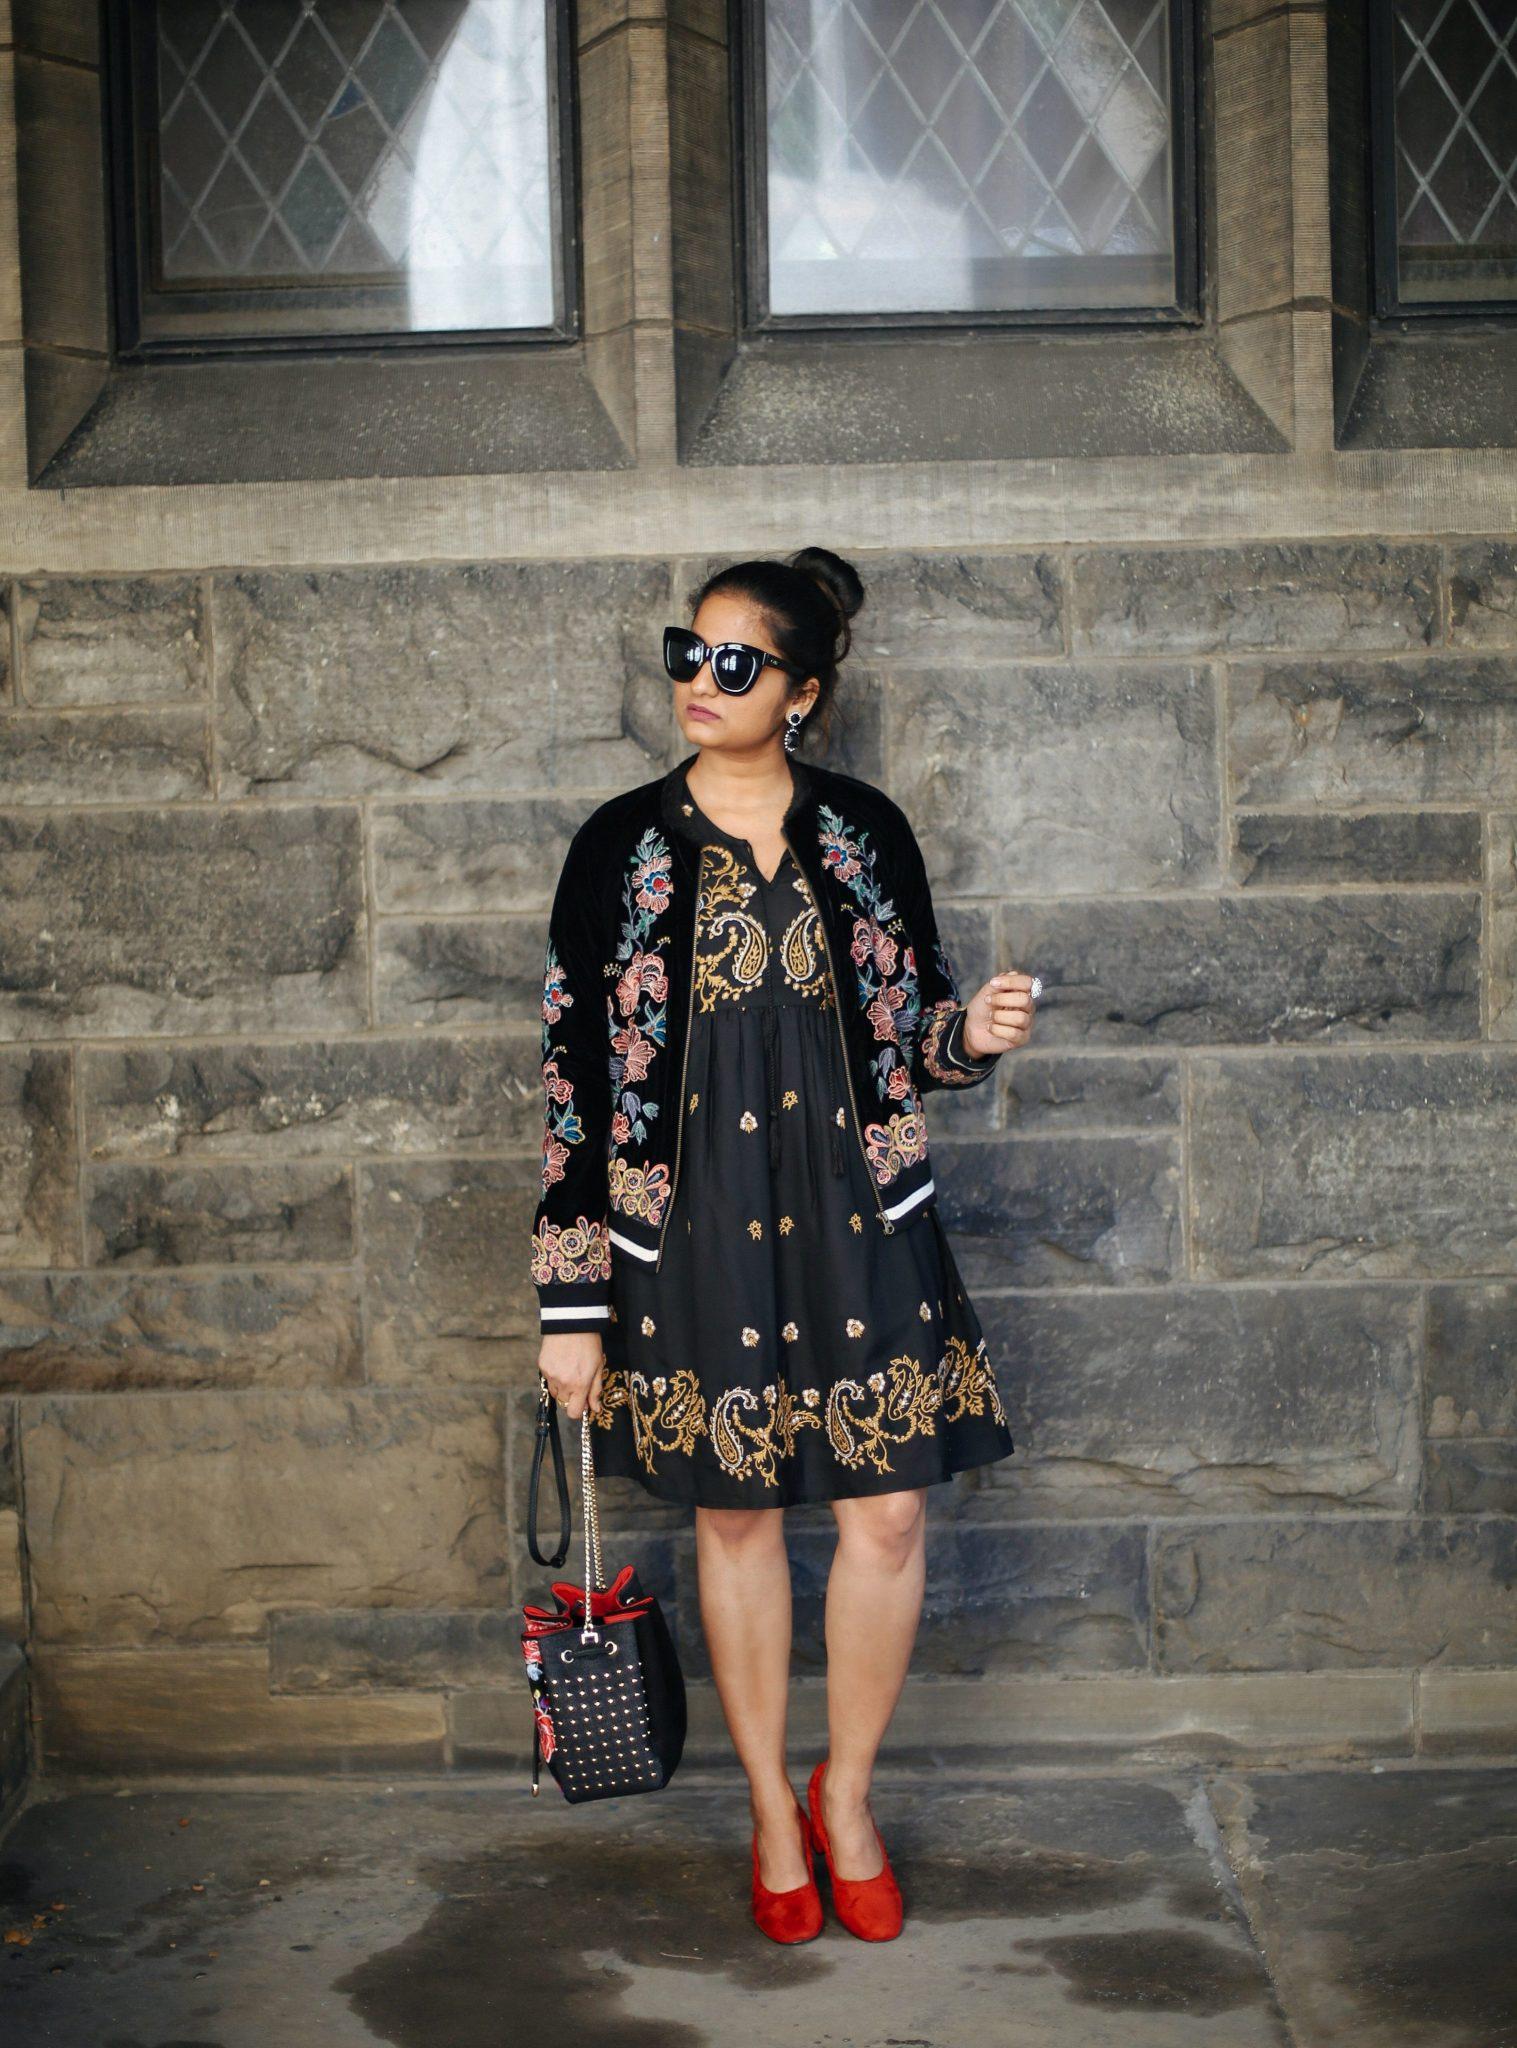 Asos-glamorous-paisley-print-dress (2)